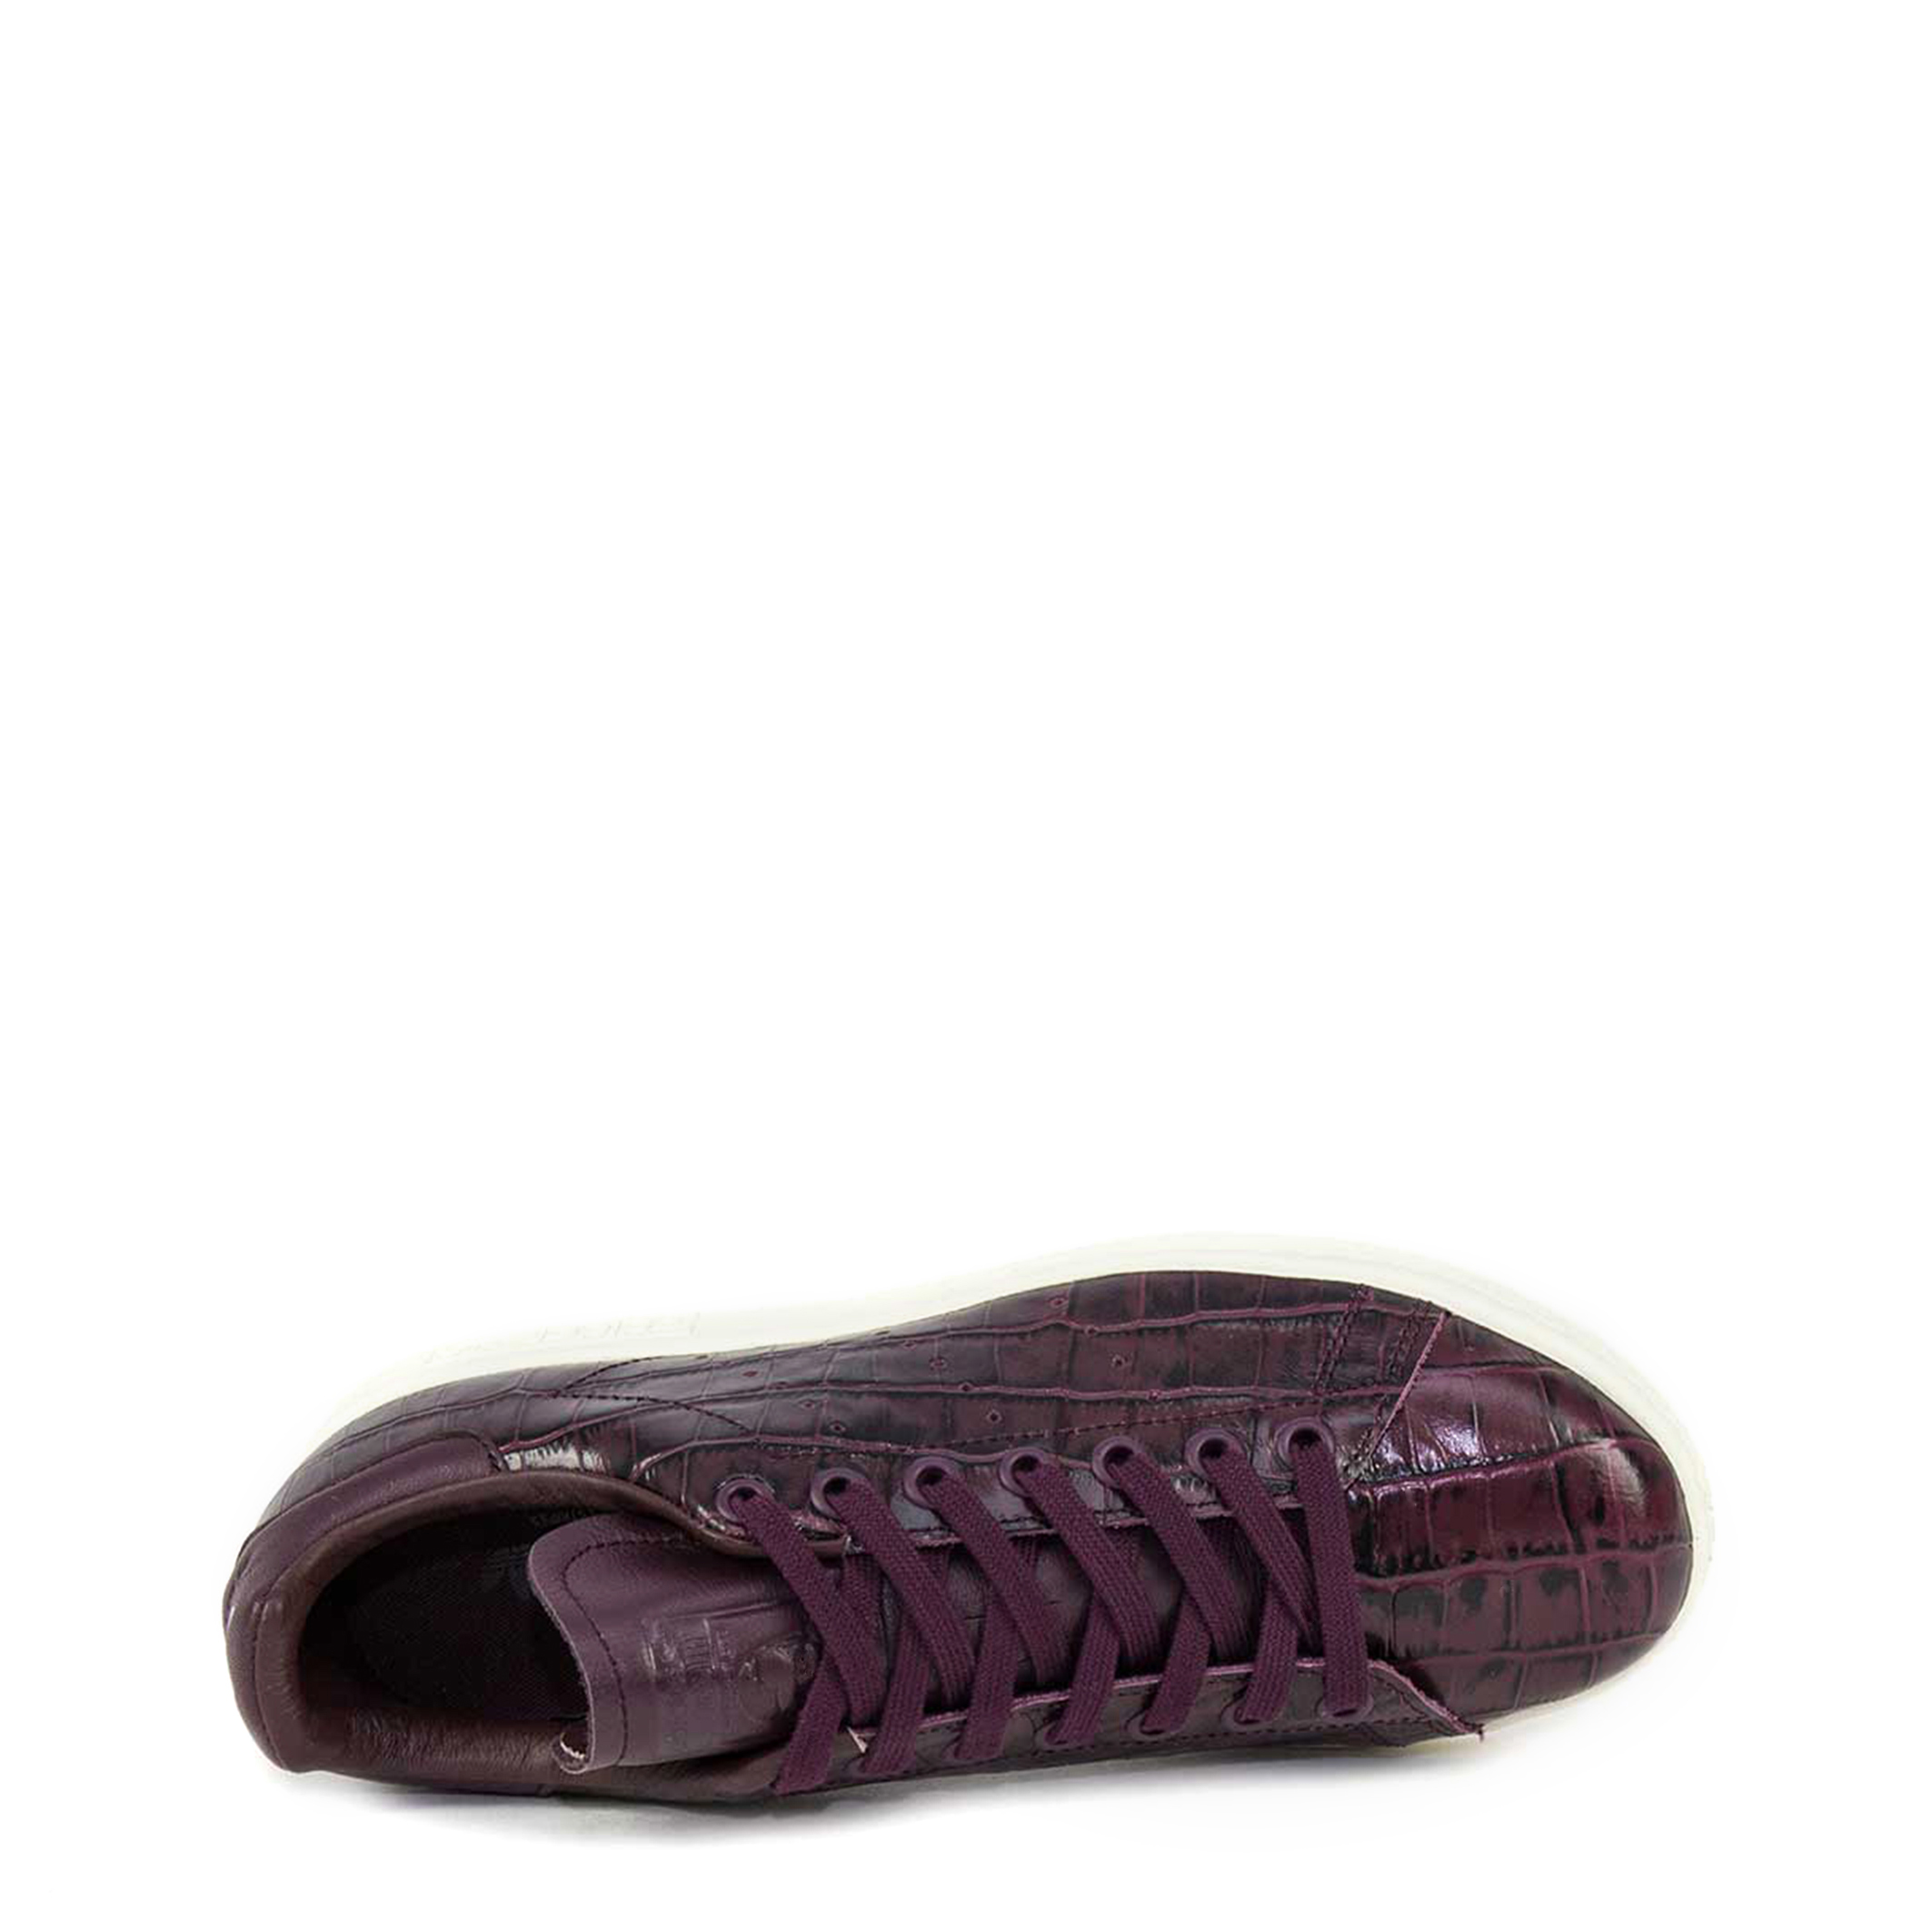 Baskets / Sport  Adidas StanSmith violet